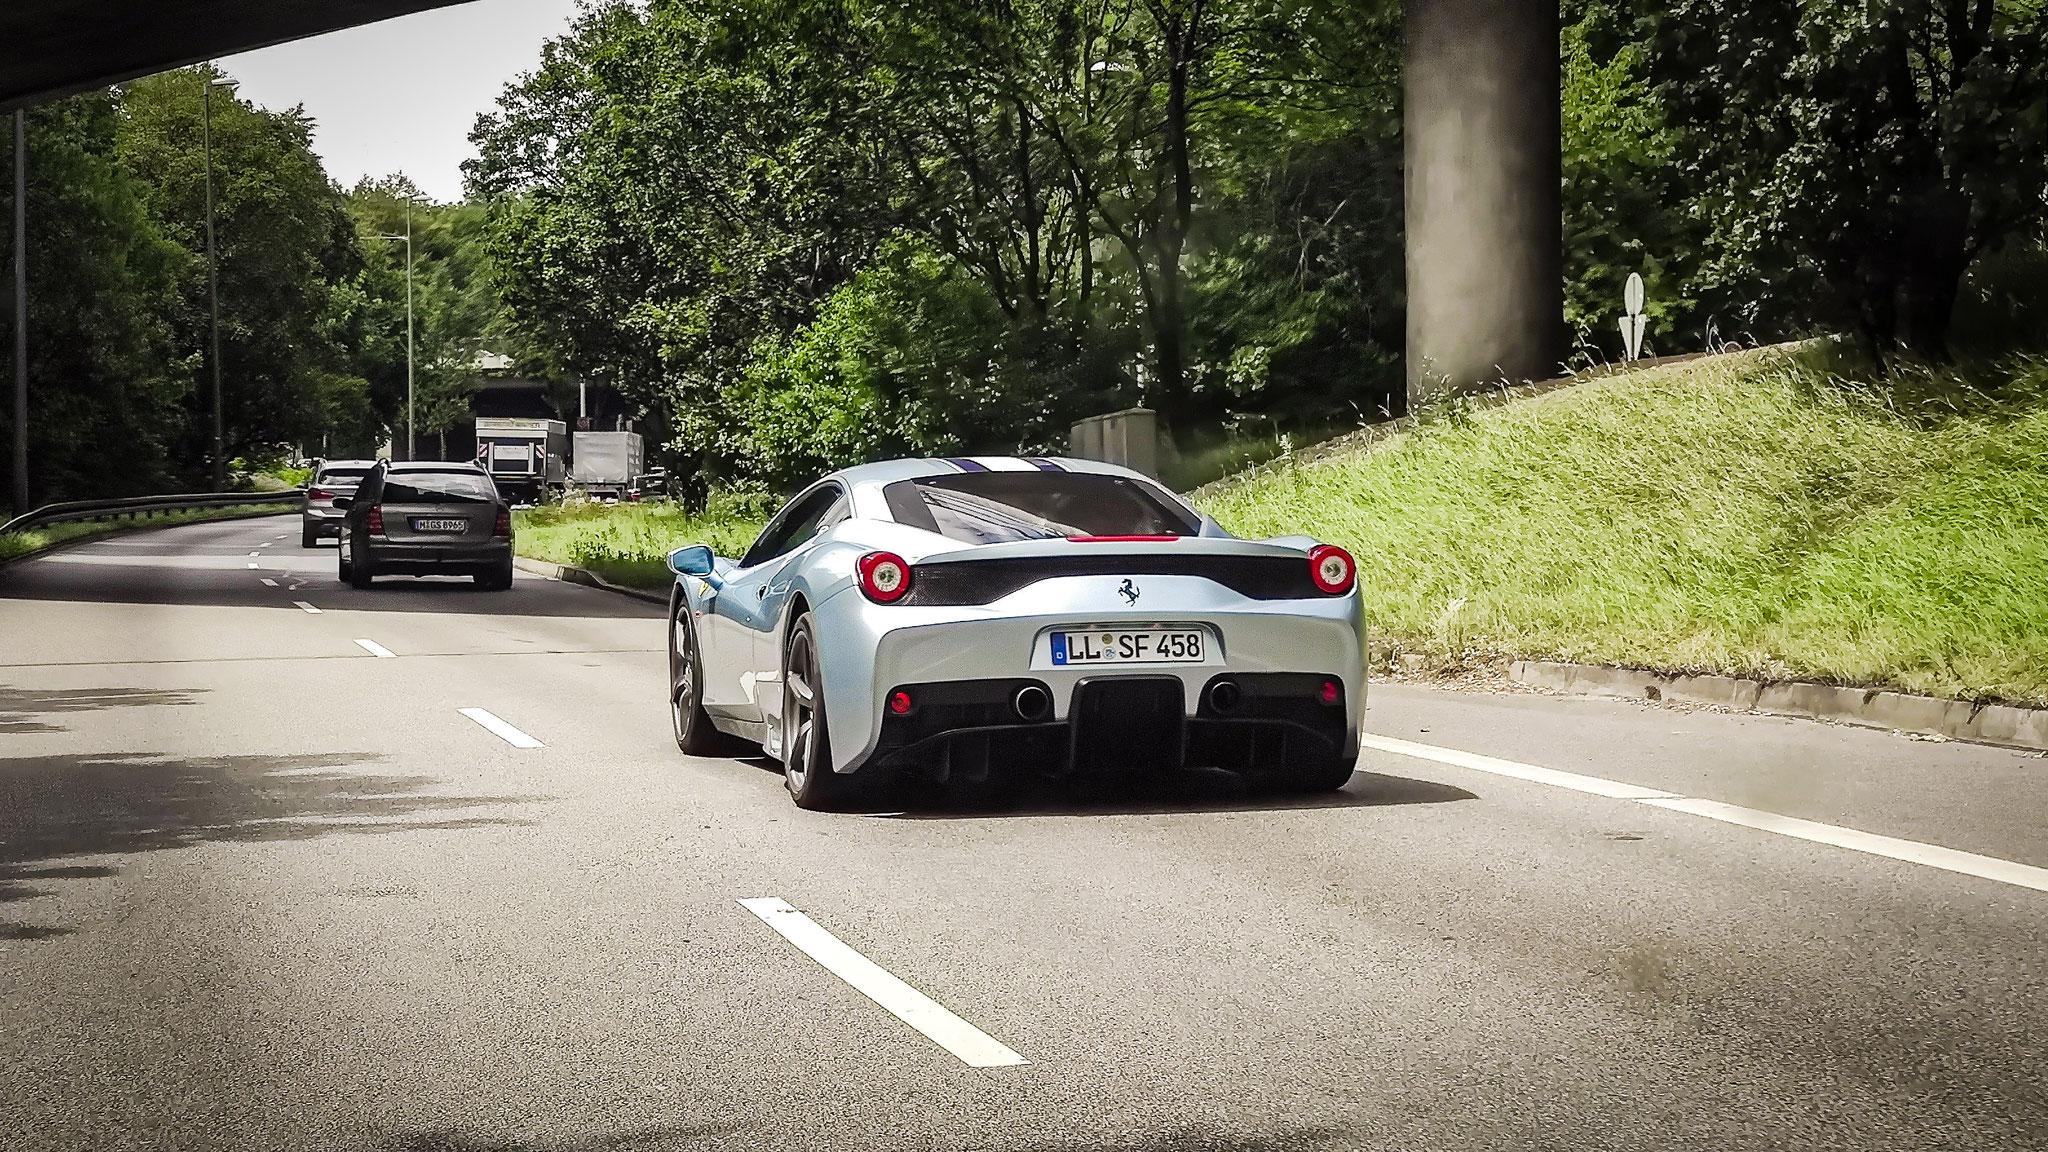 Ferrari 458 Speciale - LL-SF-458